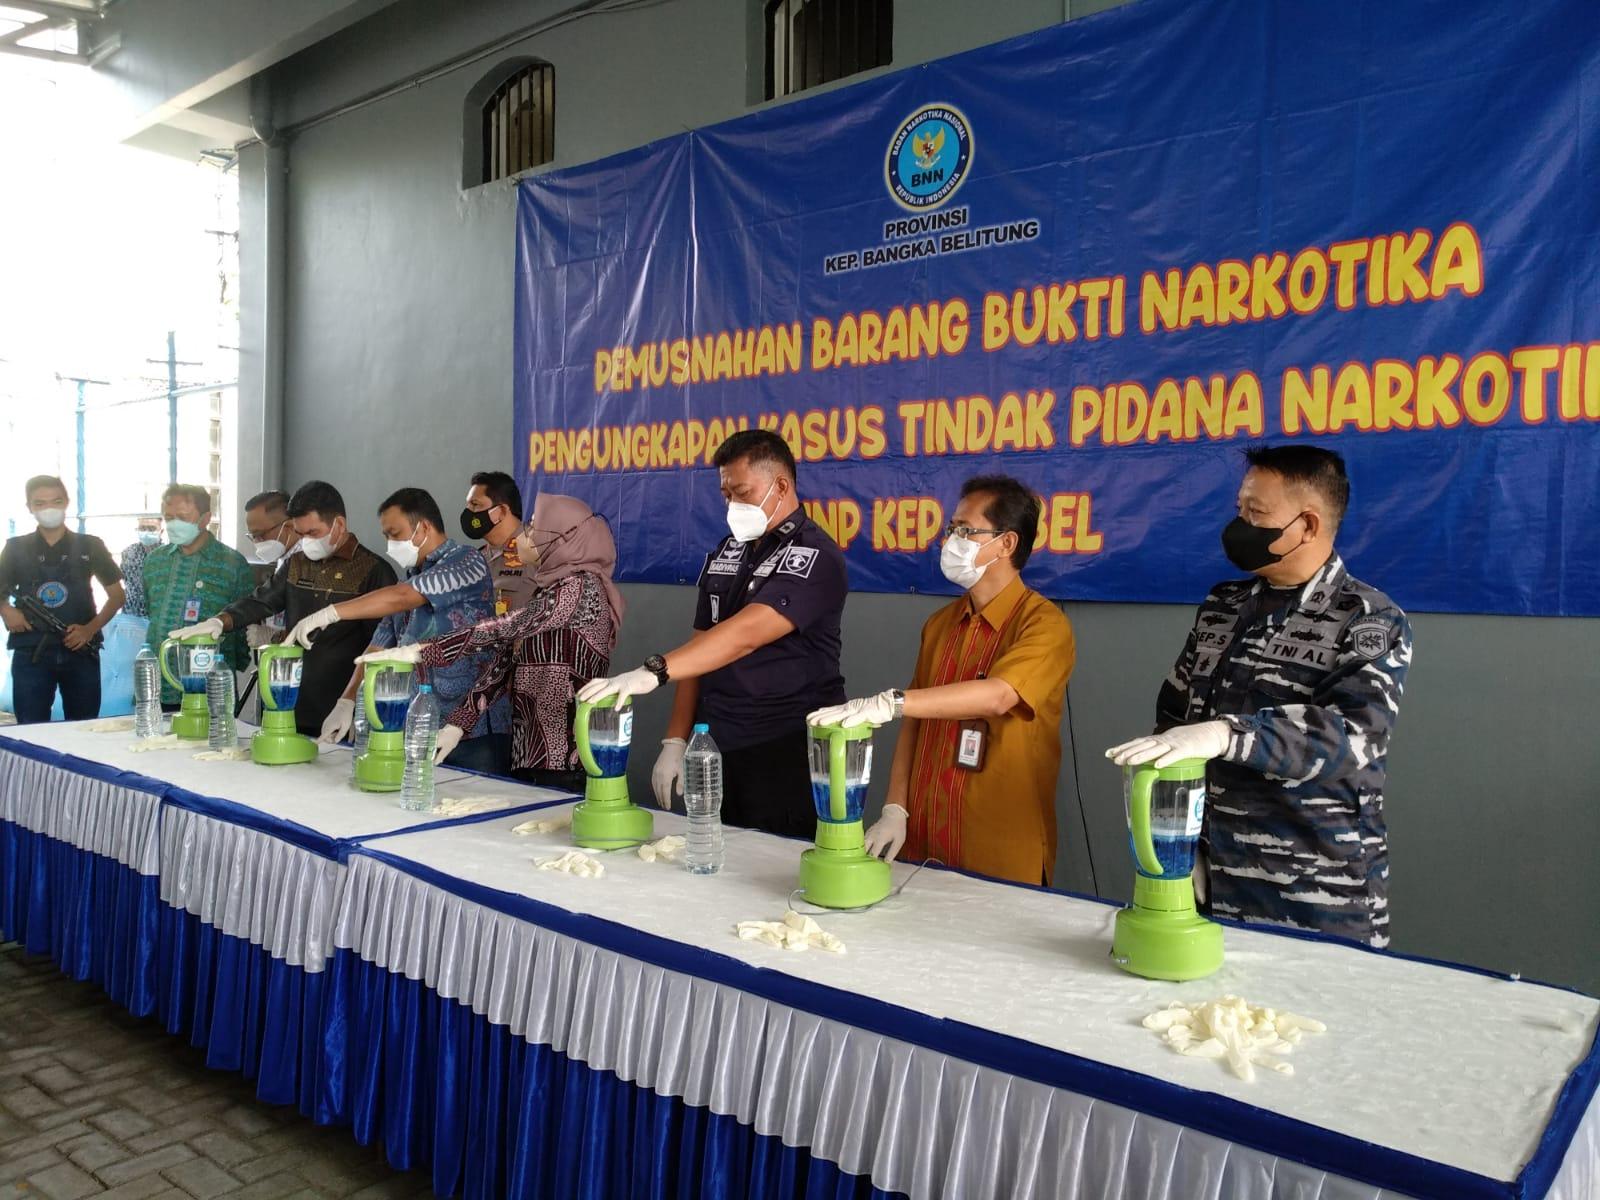 Tim Gabungan Sikat Mertua dan Menantu Pembawa Barang Haram (Sabu)